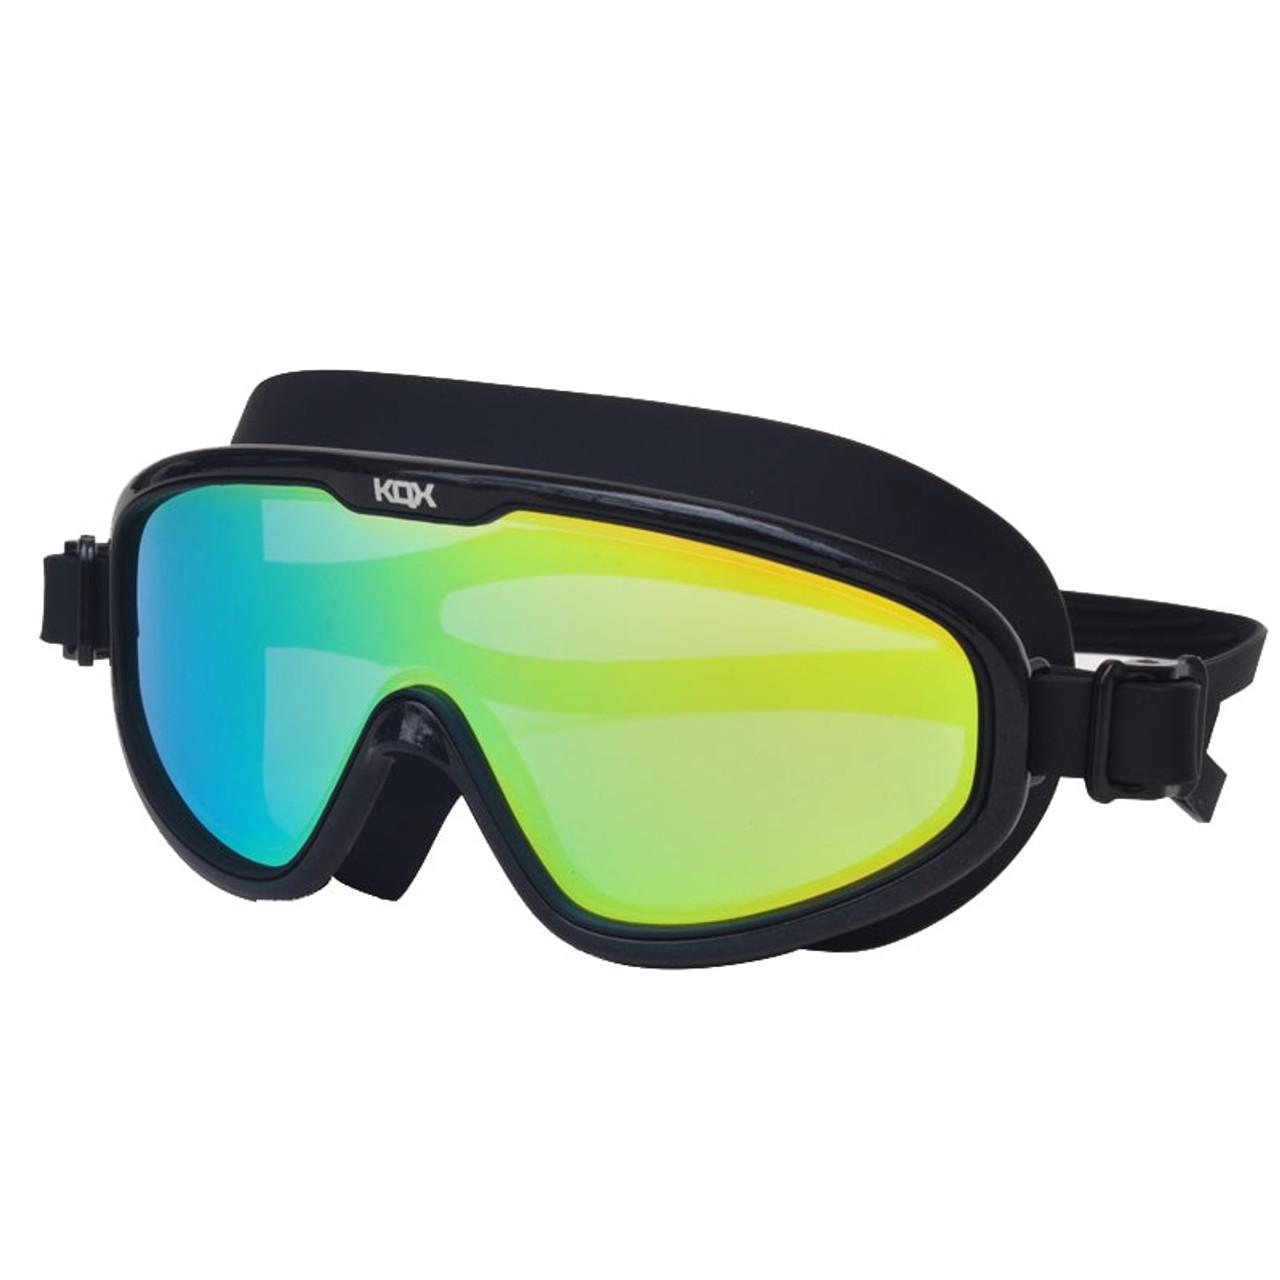 07ab82b88c5 Professional big frame Anti-Fog UV Swimming glasses silicone Waterproof  Swim goggles in Poor for ...